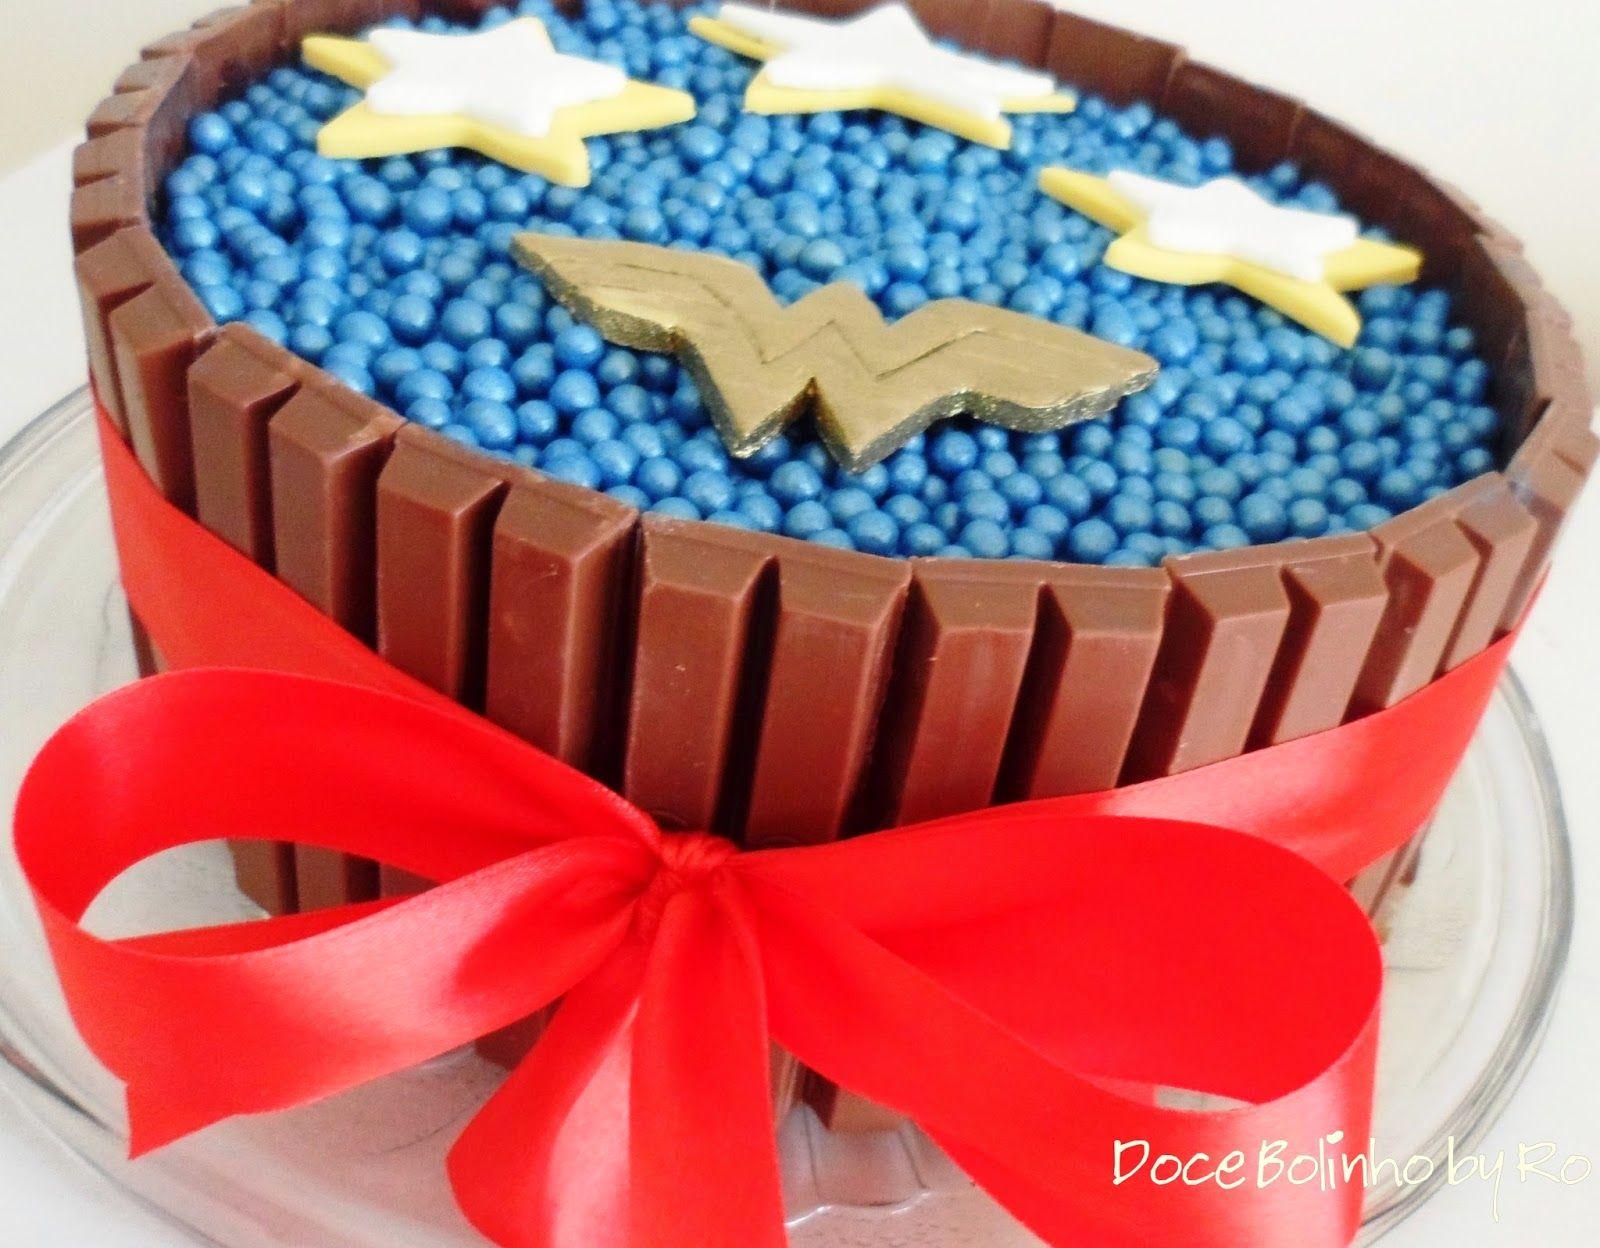 Bolo De Aniversário: Bolo Kit Kat - Mulher Maravilha